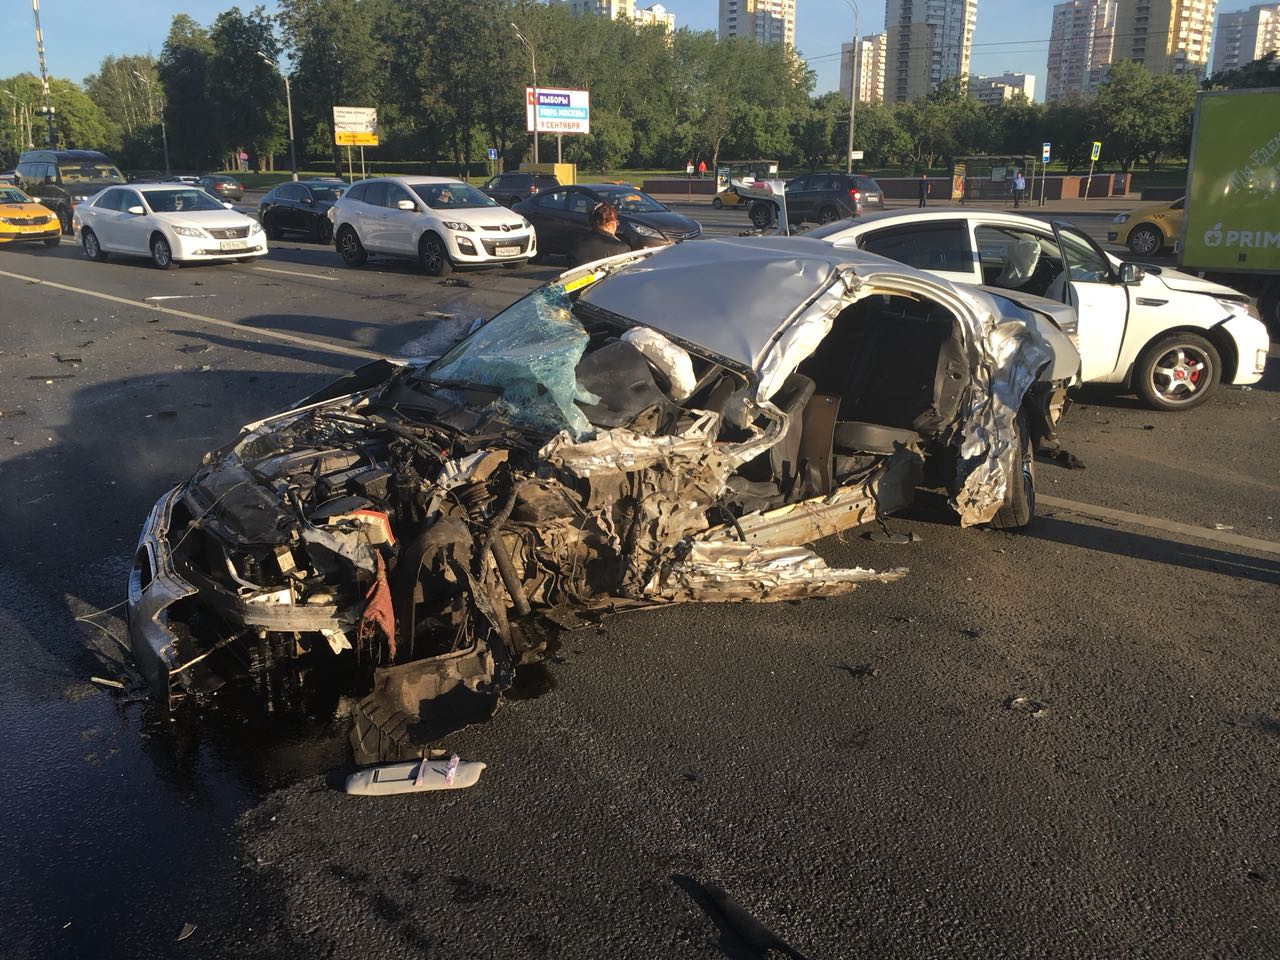 На Кутузовском проспекте в районе метро «Славянский бульвар» произошла крупная авария